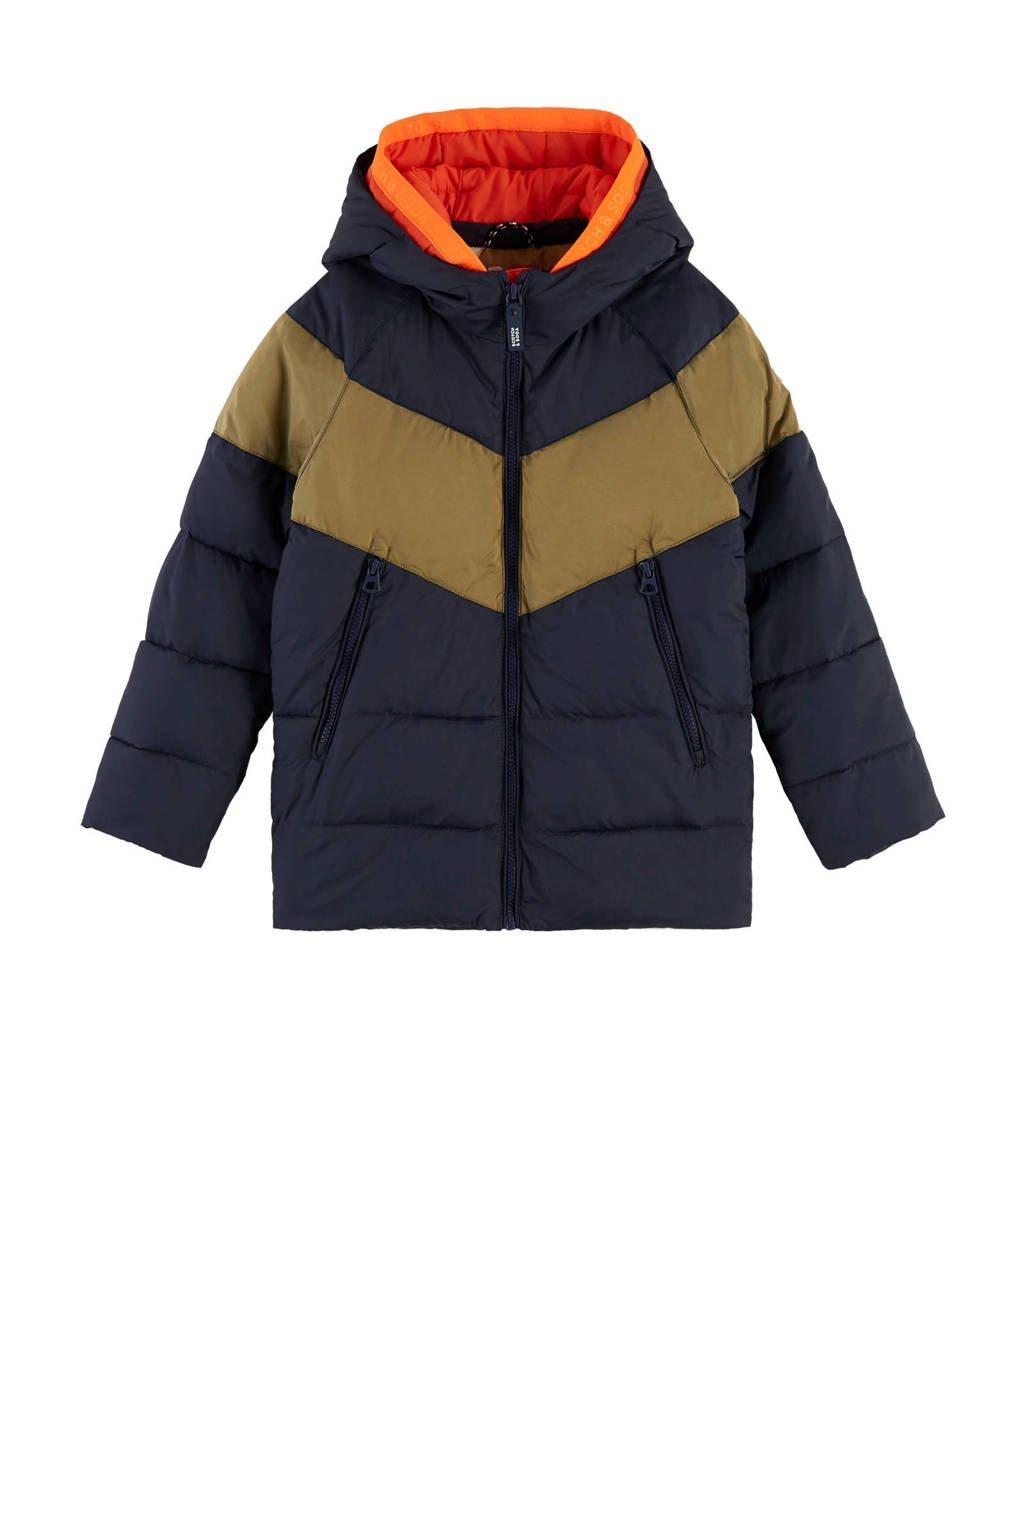 Scotch & Soda gewatteerde jas donkerblauw/bruin, Donkerblauw/bruin